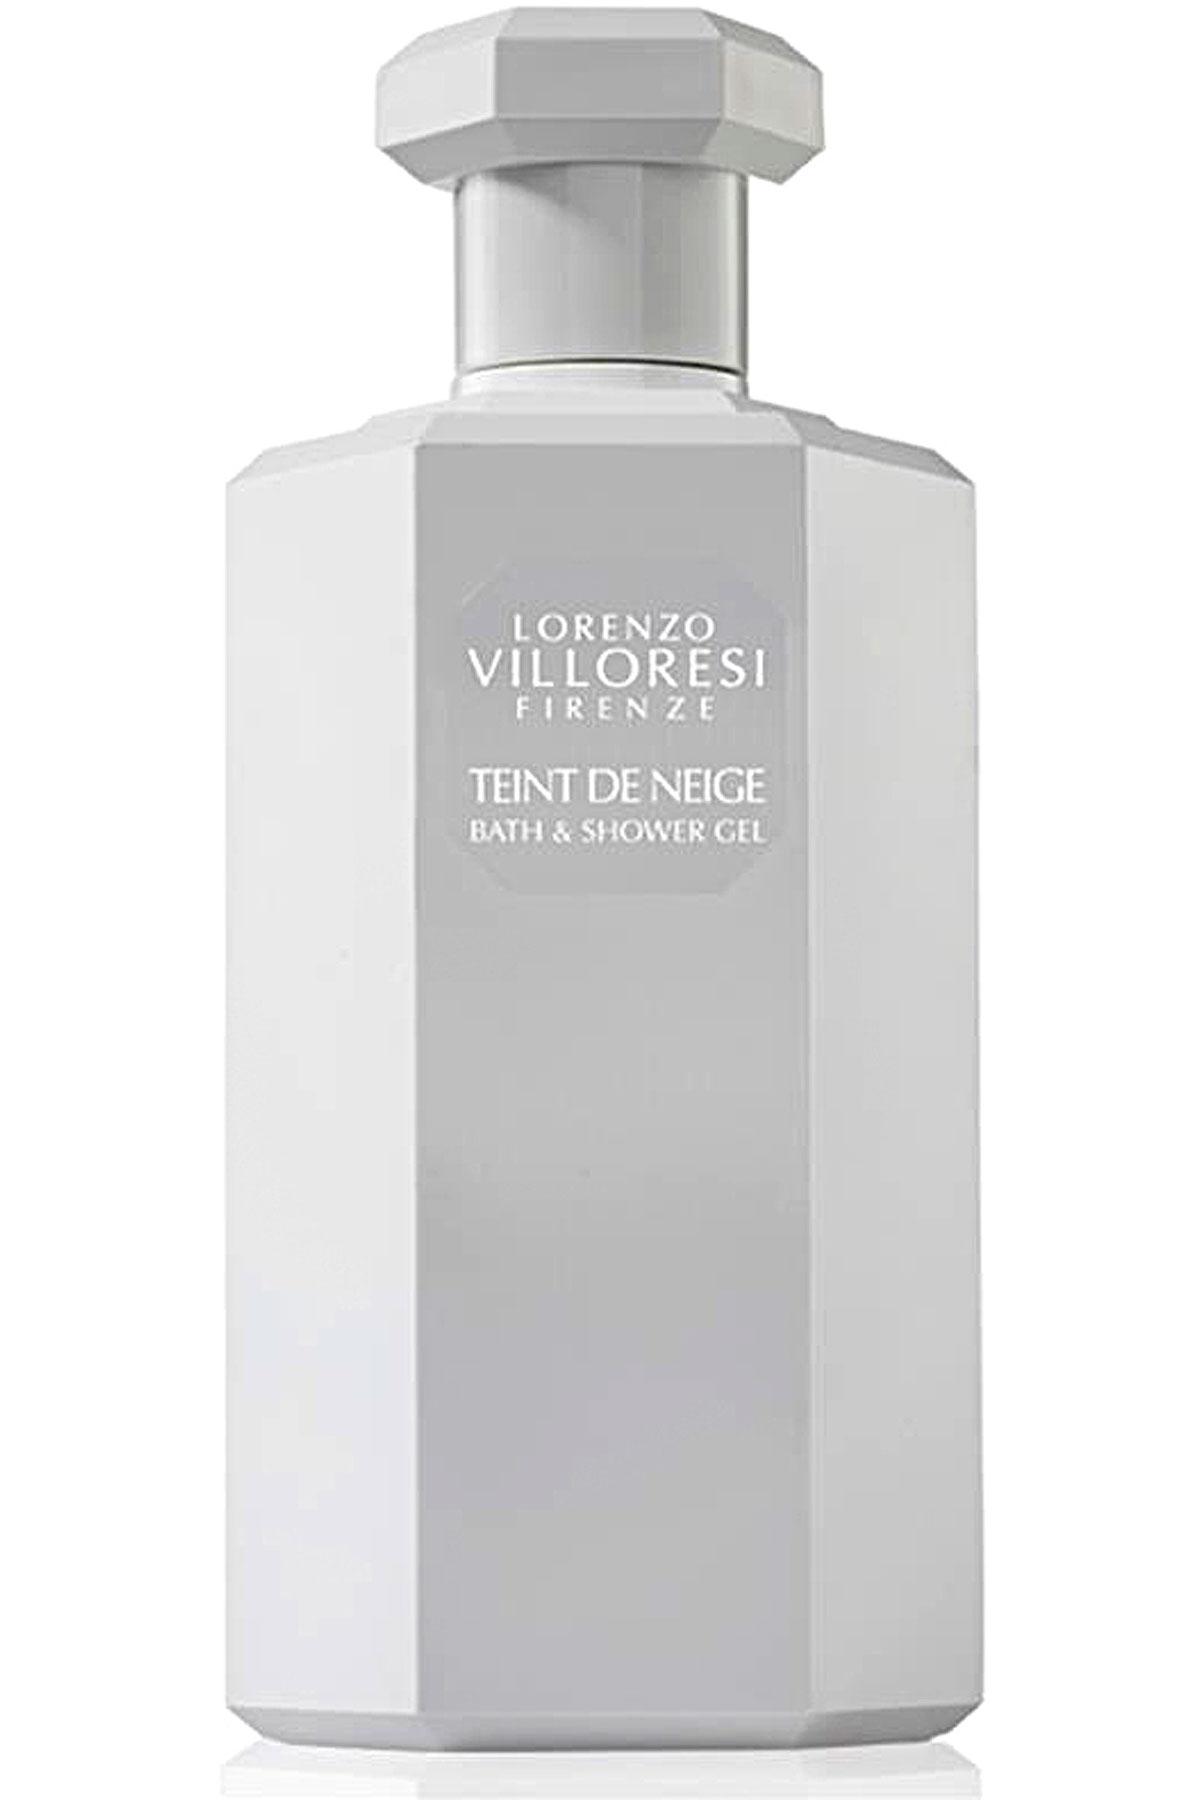 Lorenzo Villoresi Beauty for Men, Teint De Neige - Bath And Shower Gel - 250 Ml, 2019, 250 ml